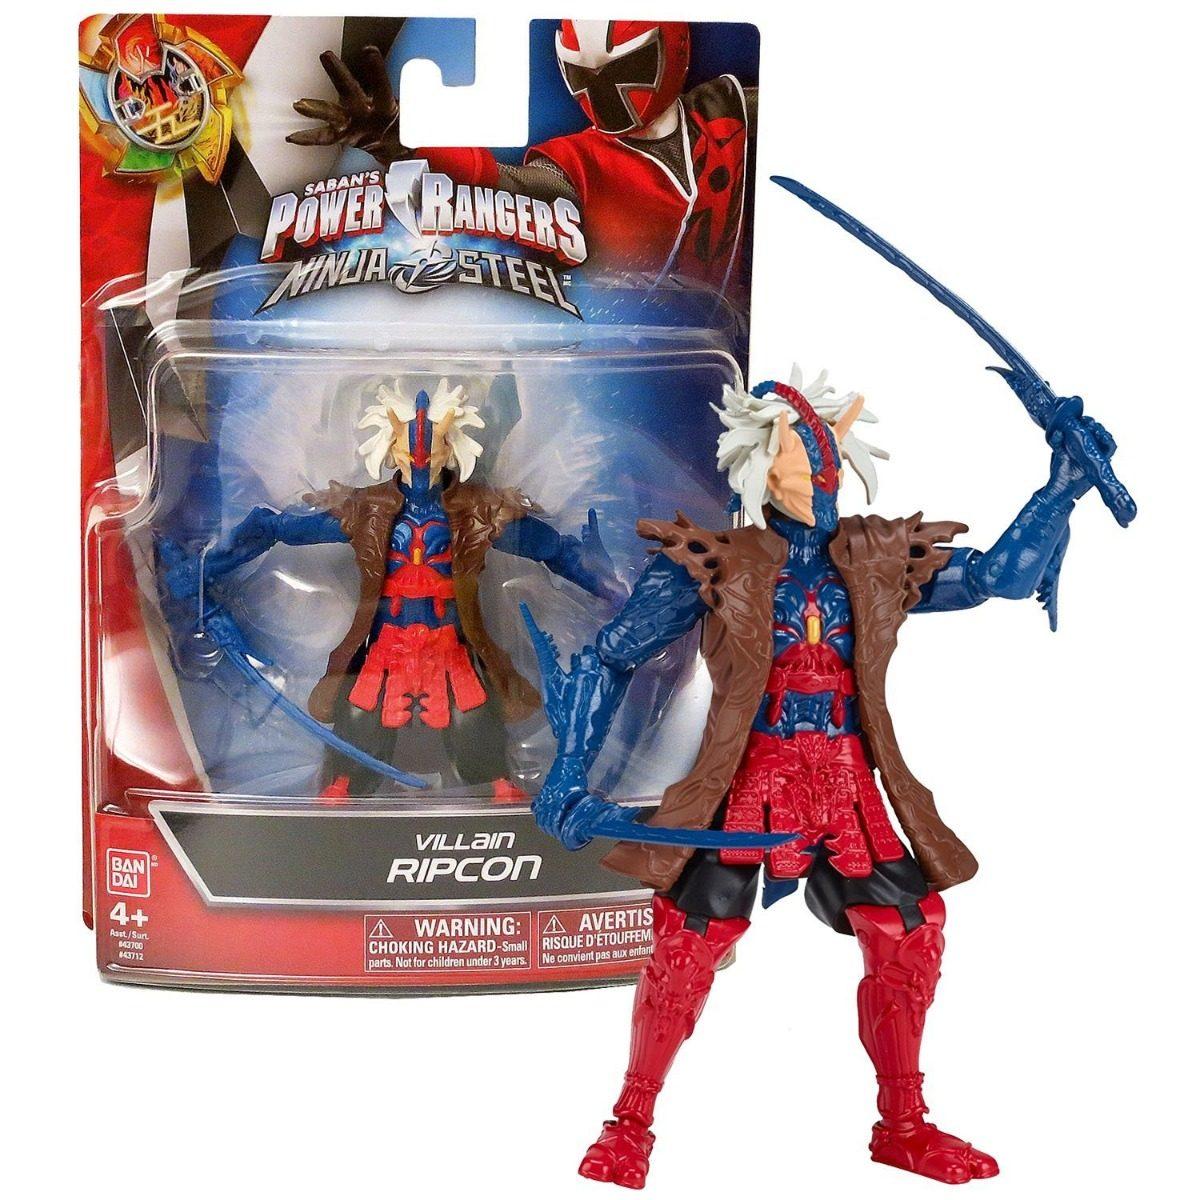 Power Rangers Ninja Steel Villano Ripcon Ban43712 Bumerang